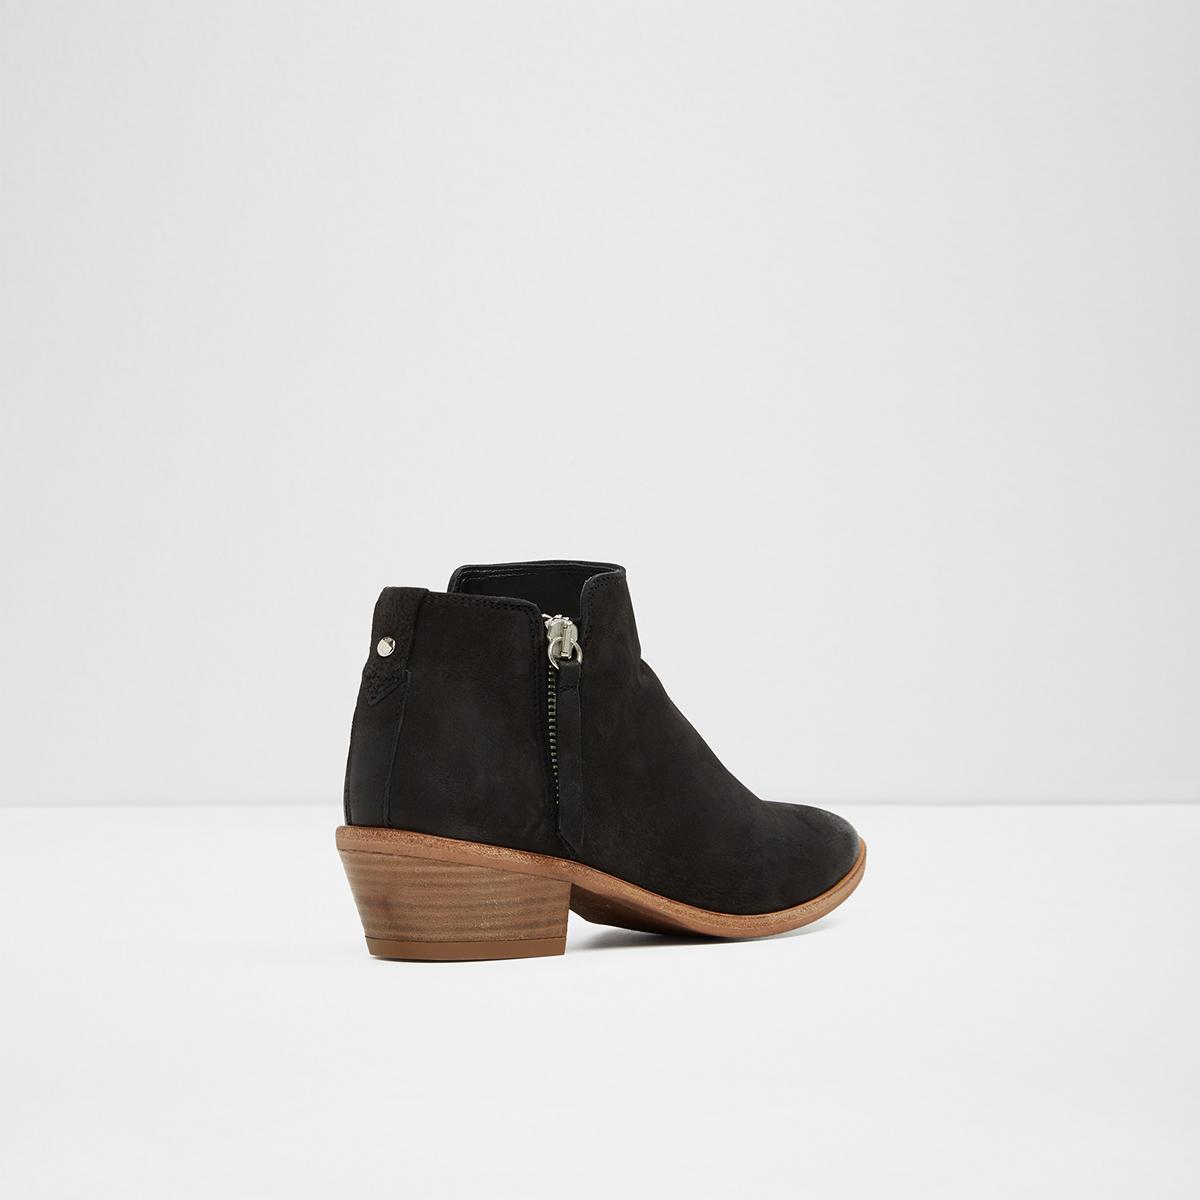 0fbf689c982d Veradia Black Nubuck Women s Boots